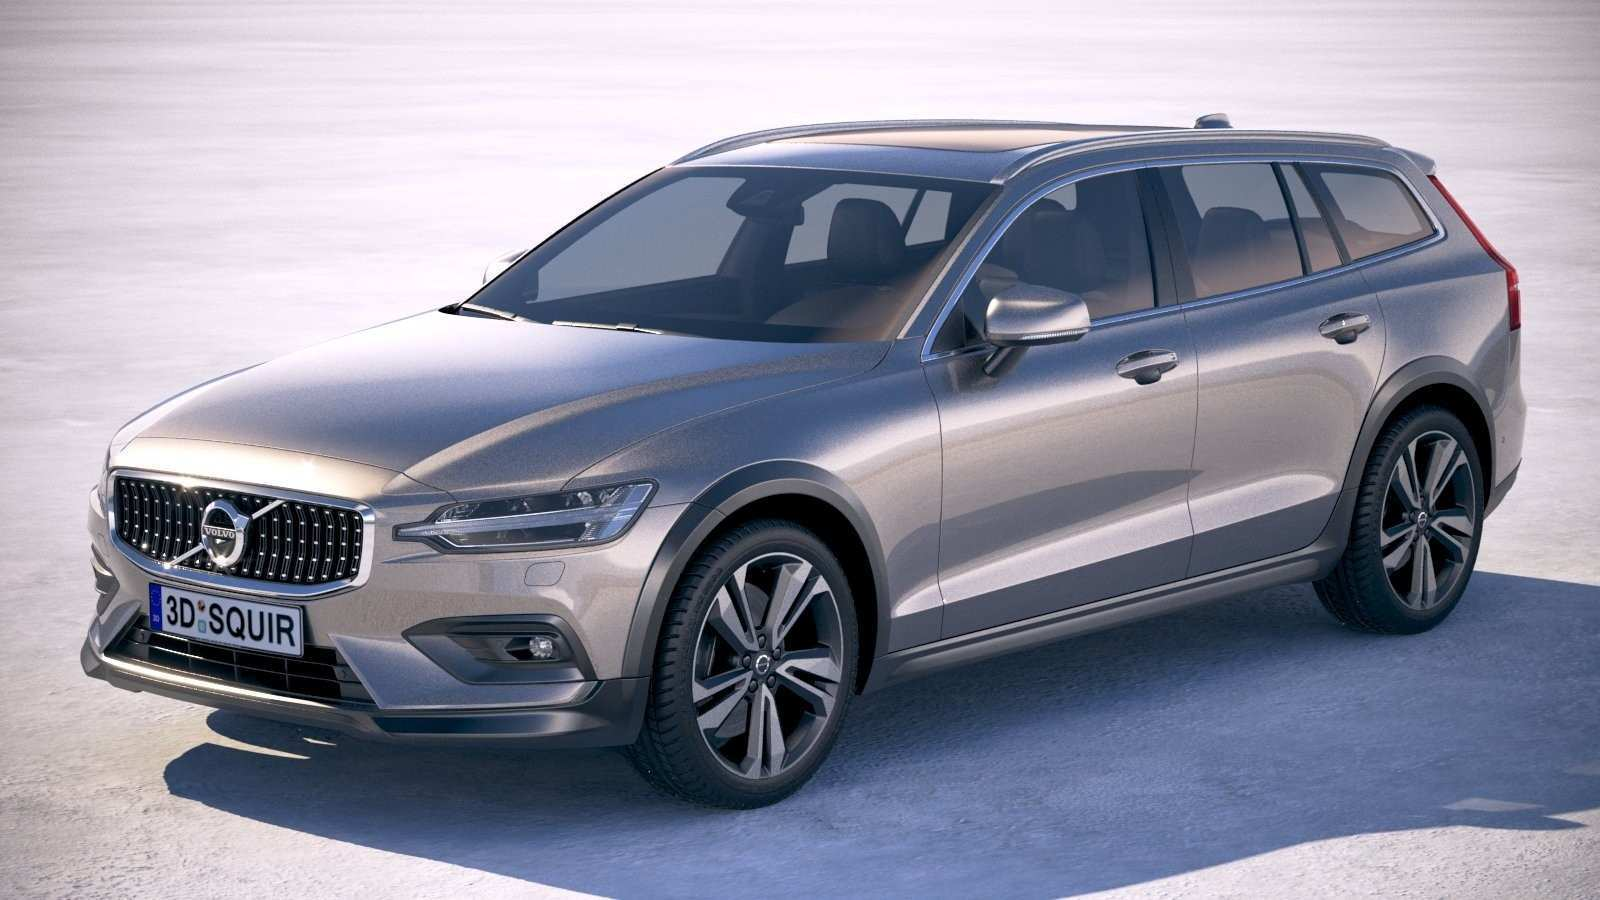 21 New 2019 Volvo V60 Cross Country Speed Test by 2019 Volvo V60 Cross Country